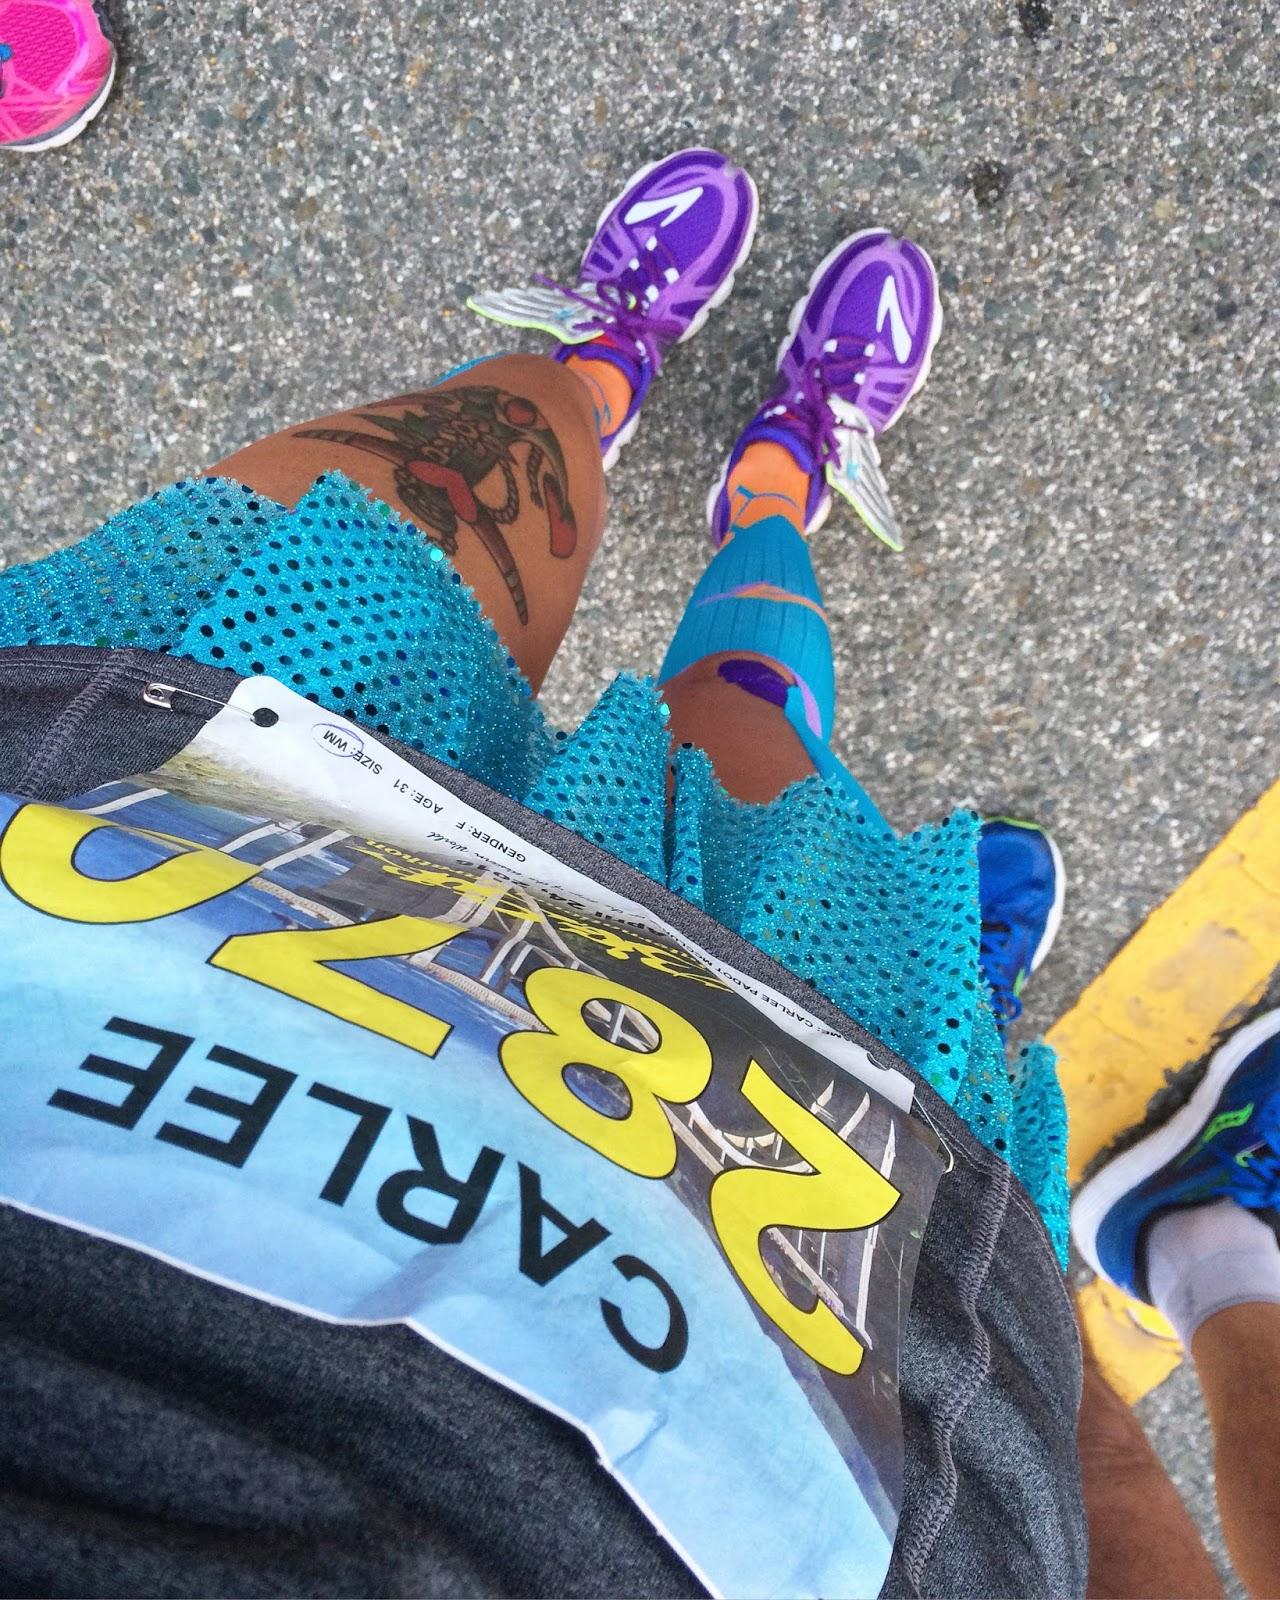 35e0bdcfc8 Carlee McDot  Big Sur International Marathon Race Recap